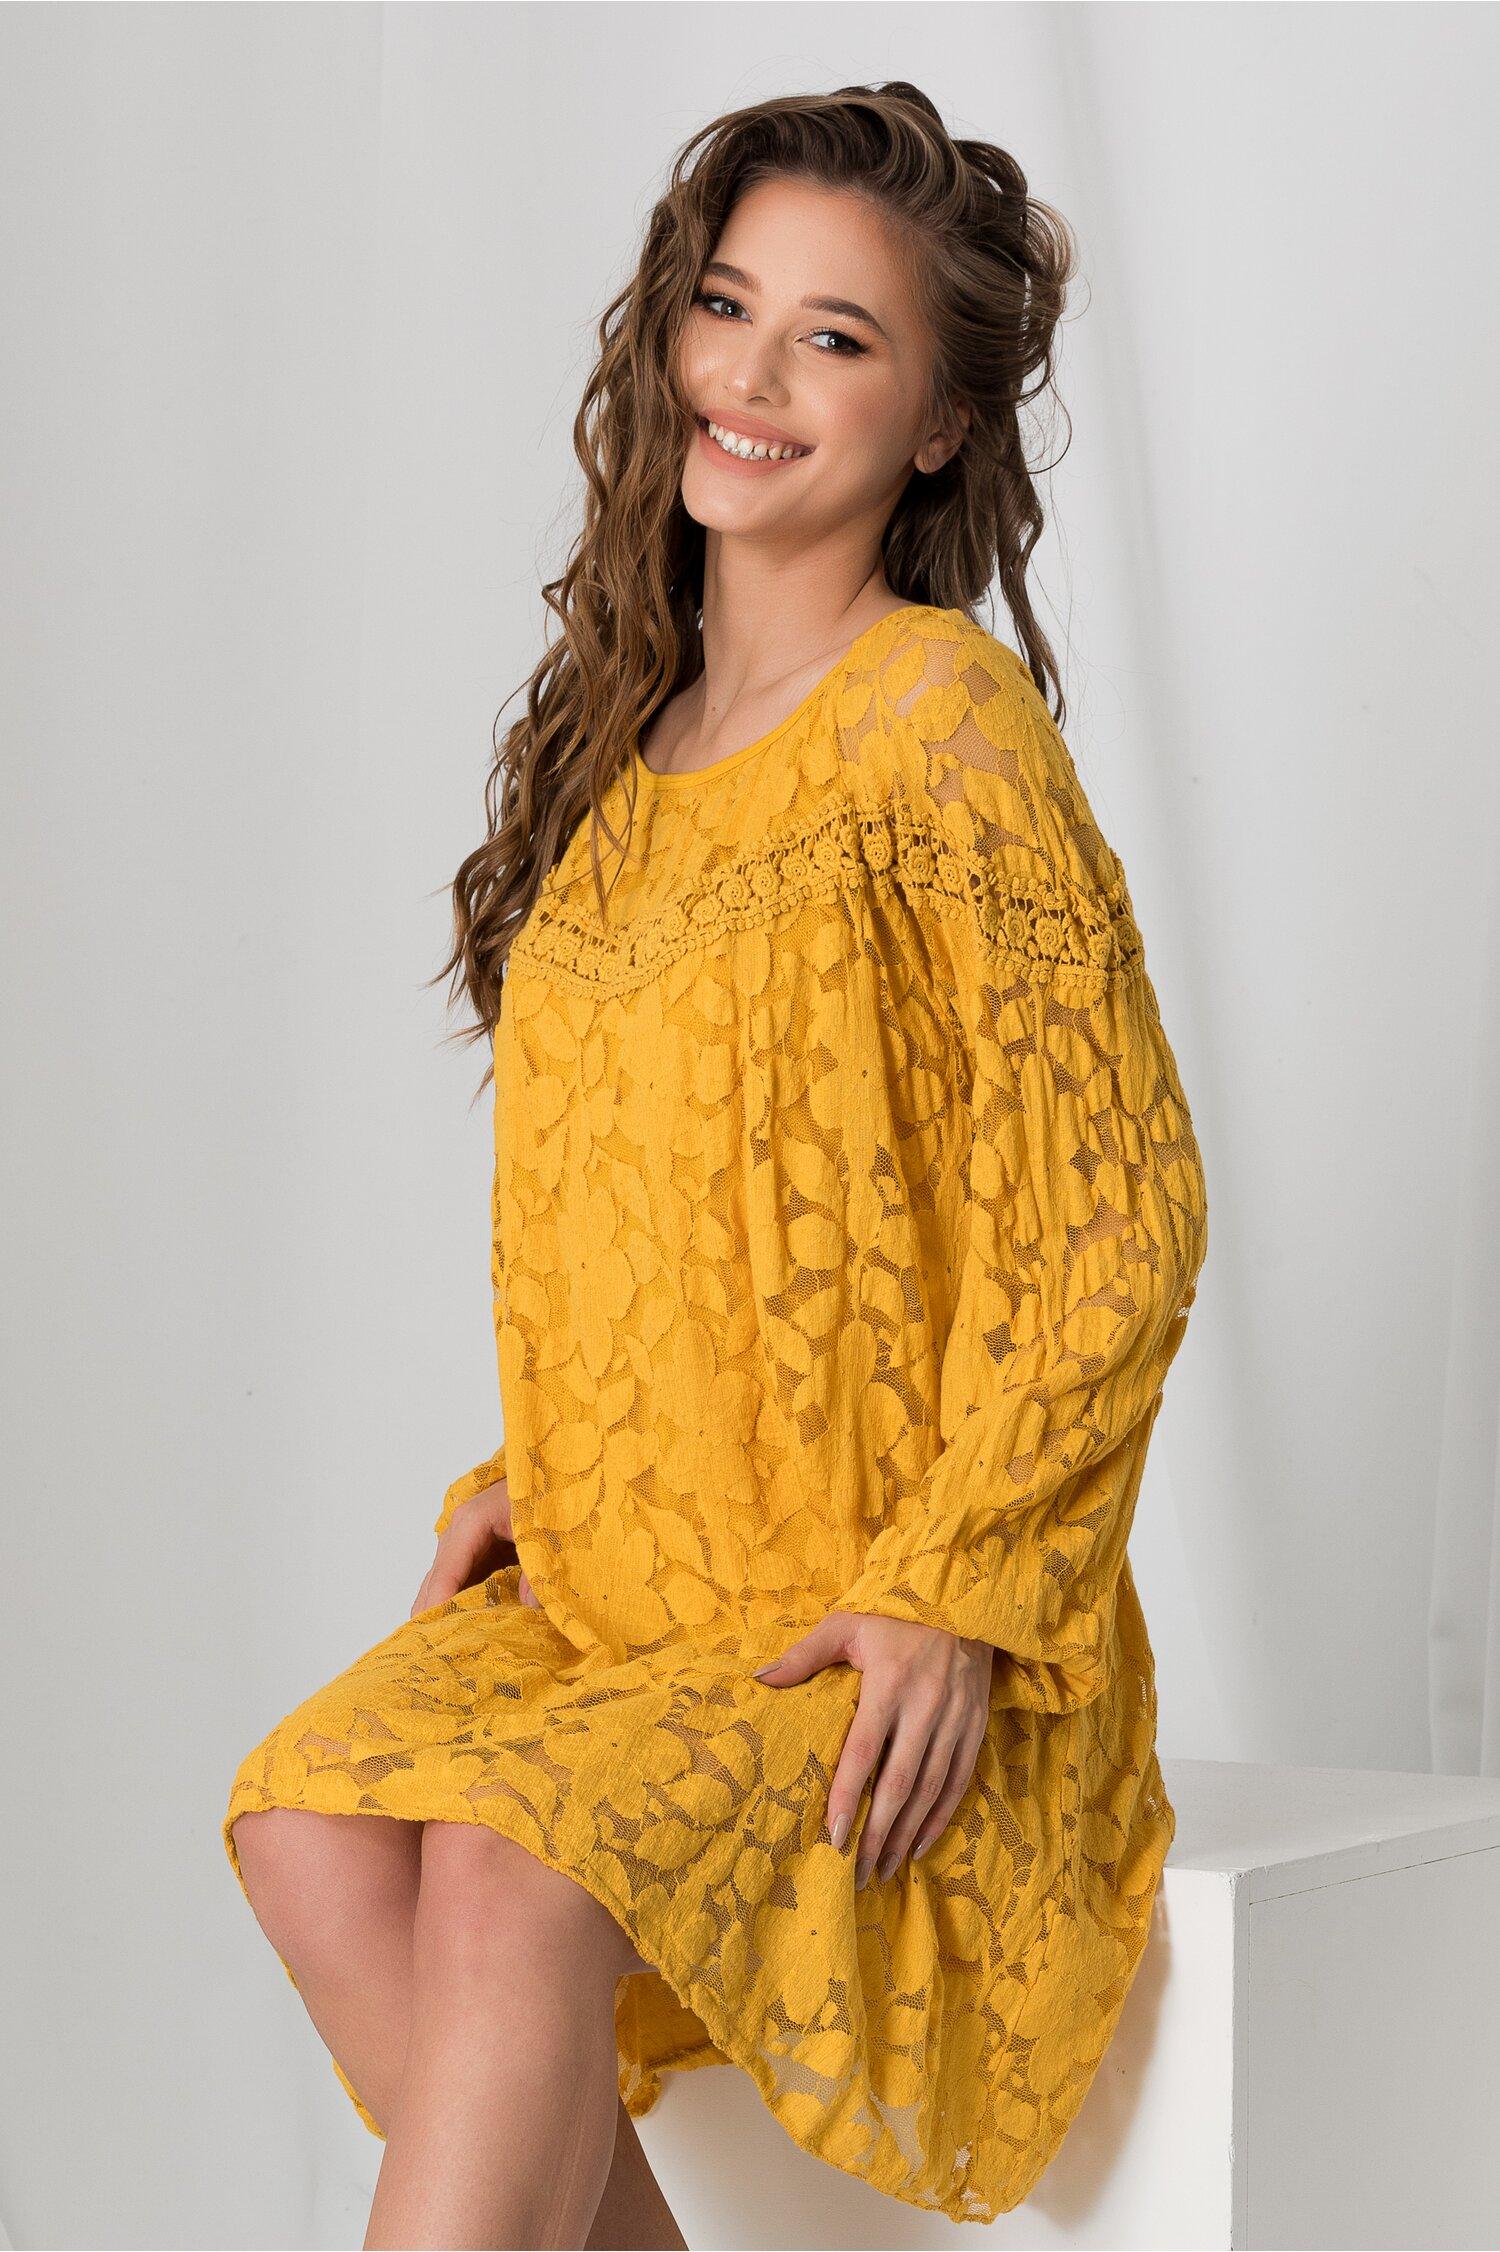 Rochie Sima galben mustar din dantela imagine dyfashion.ro 2021